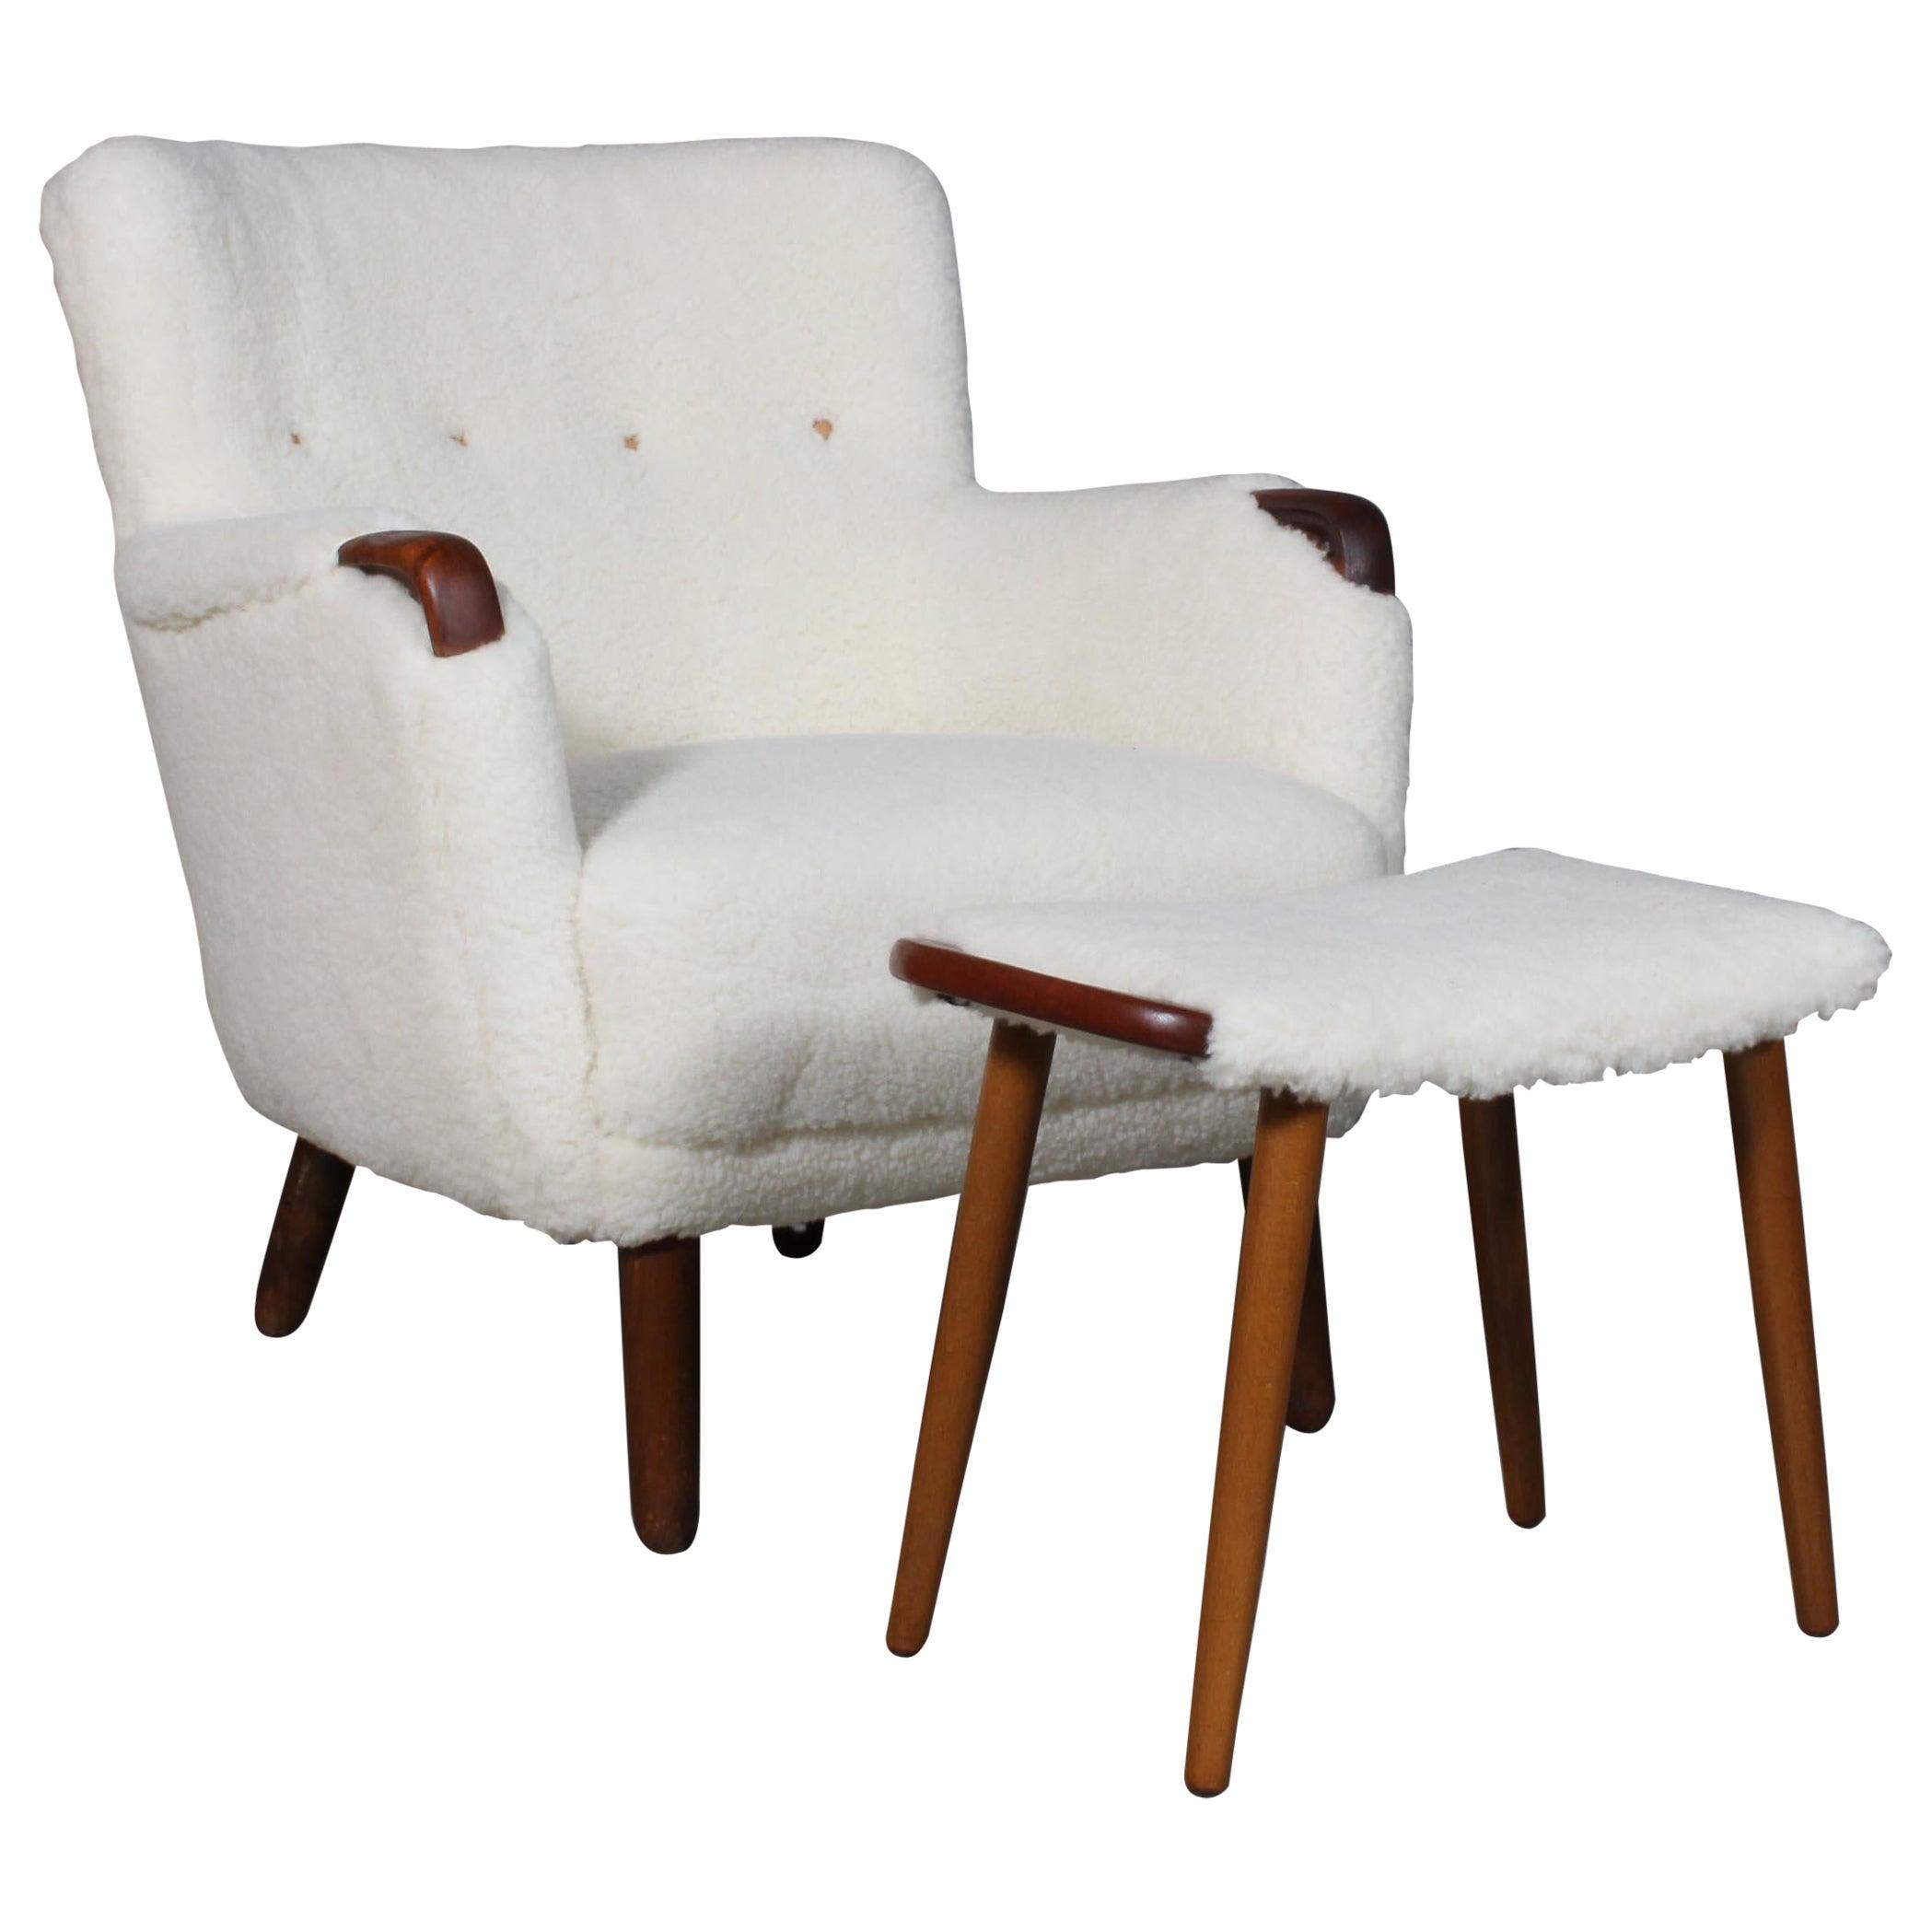 Danish Cabinetmaker, Lounge Chair and Ottoman Lambwool, 1940s